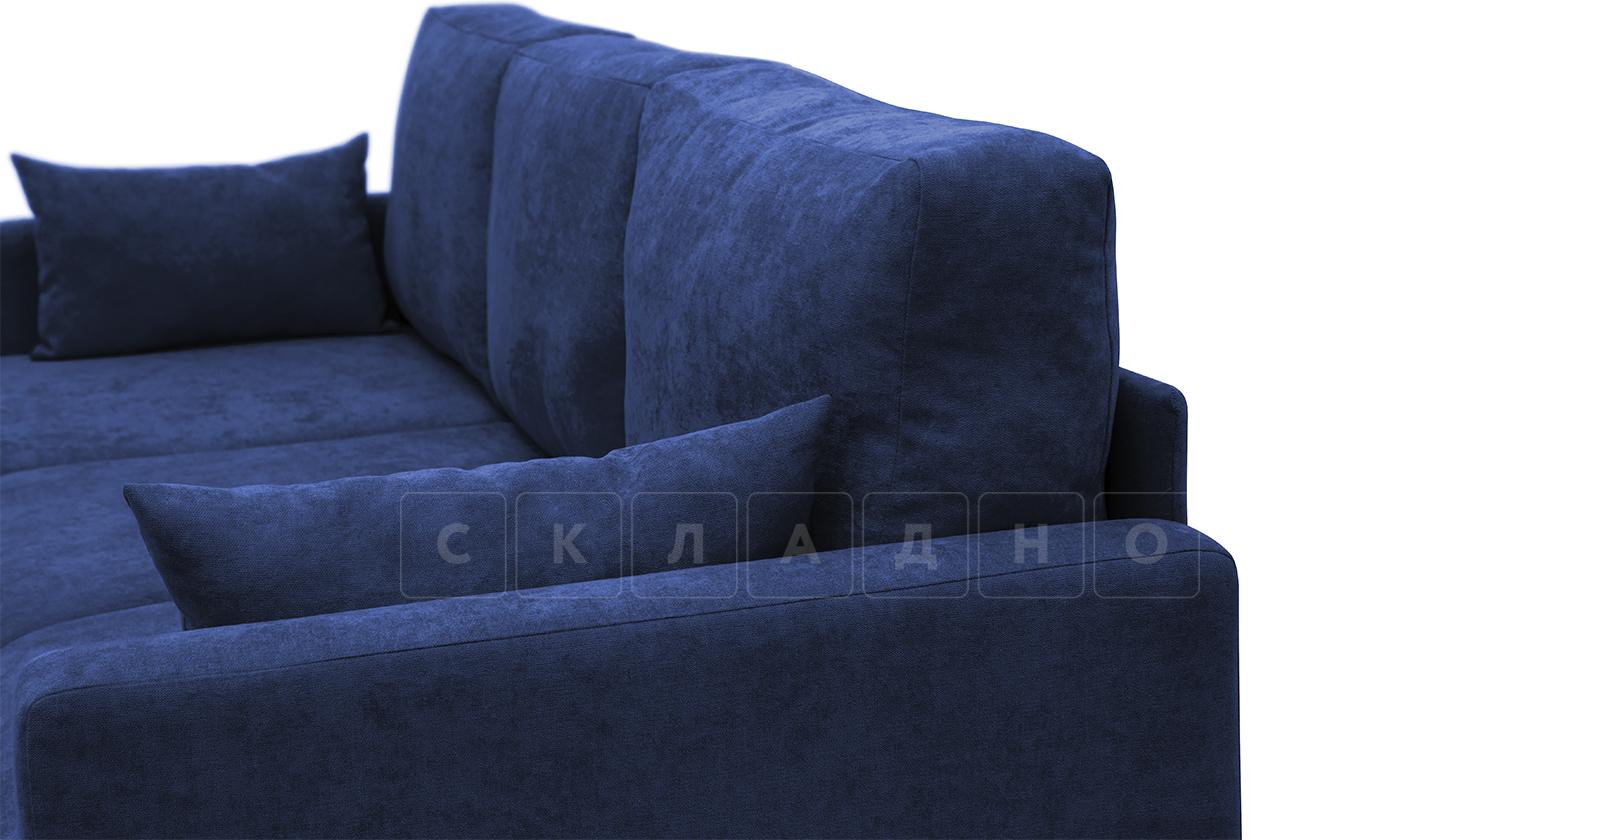 Угловой диван Дарвин темно-синий фото 11 | интернет-магазин Складно